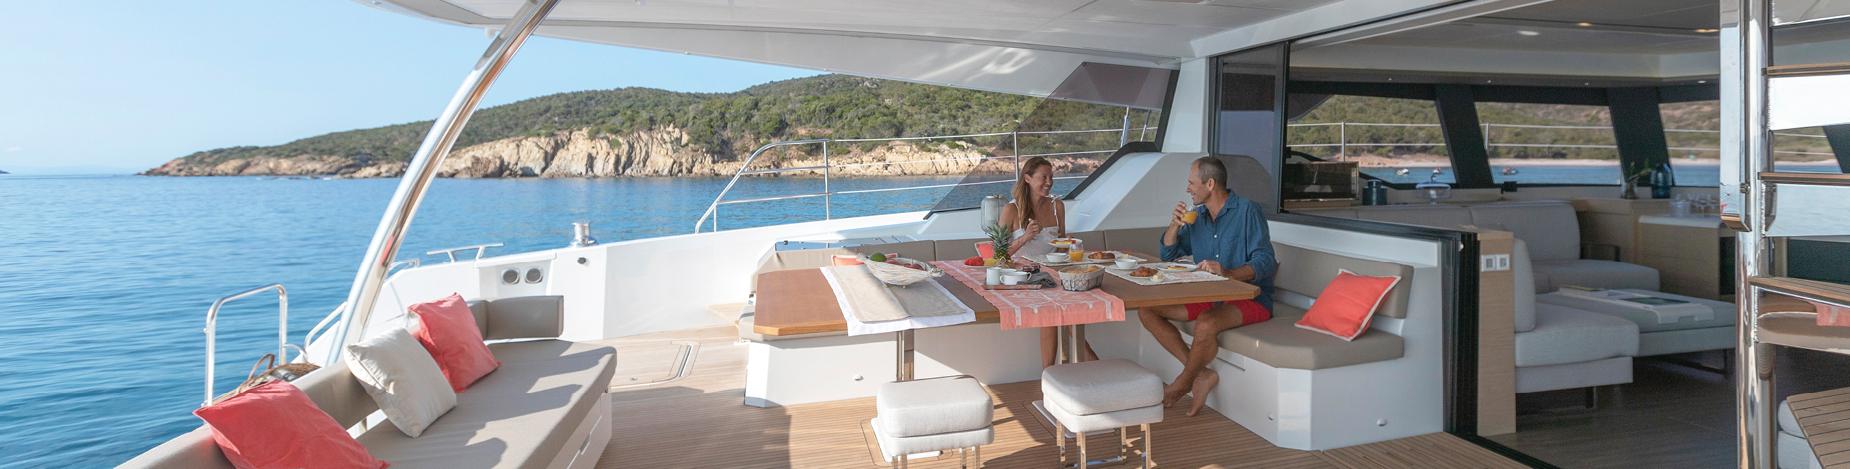 Photo-Catamaran-Range-Fountaine-Pajot-Sailing-Catamarans